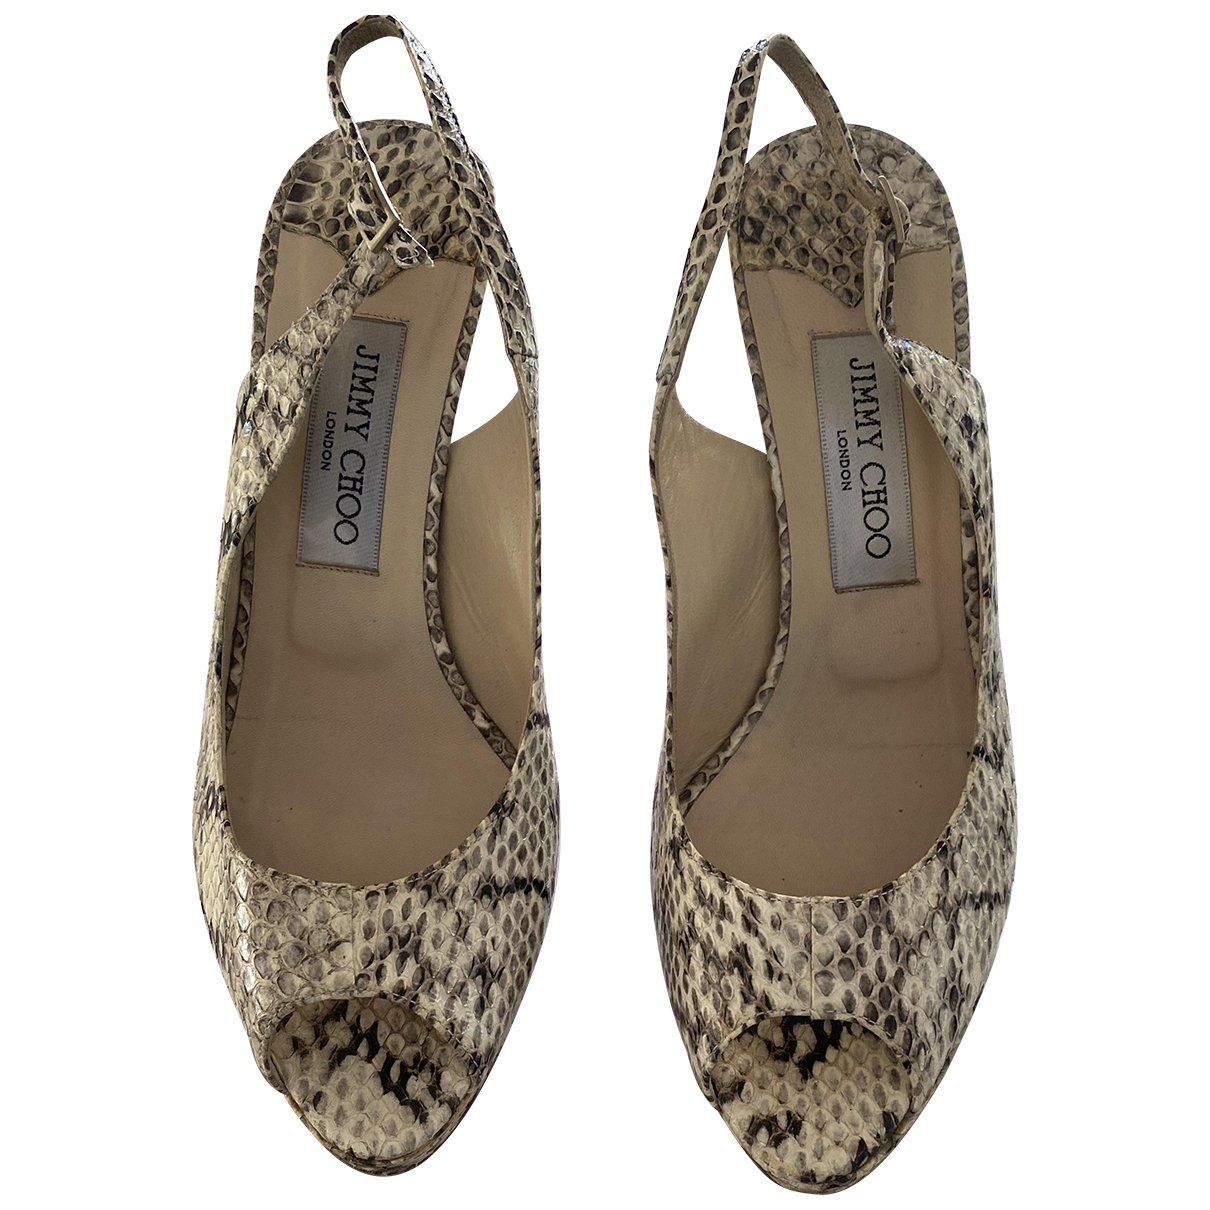 Jimmy Choo - Sandales   pour femme en serpent deau - beige